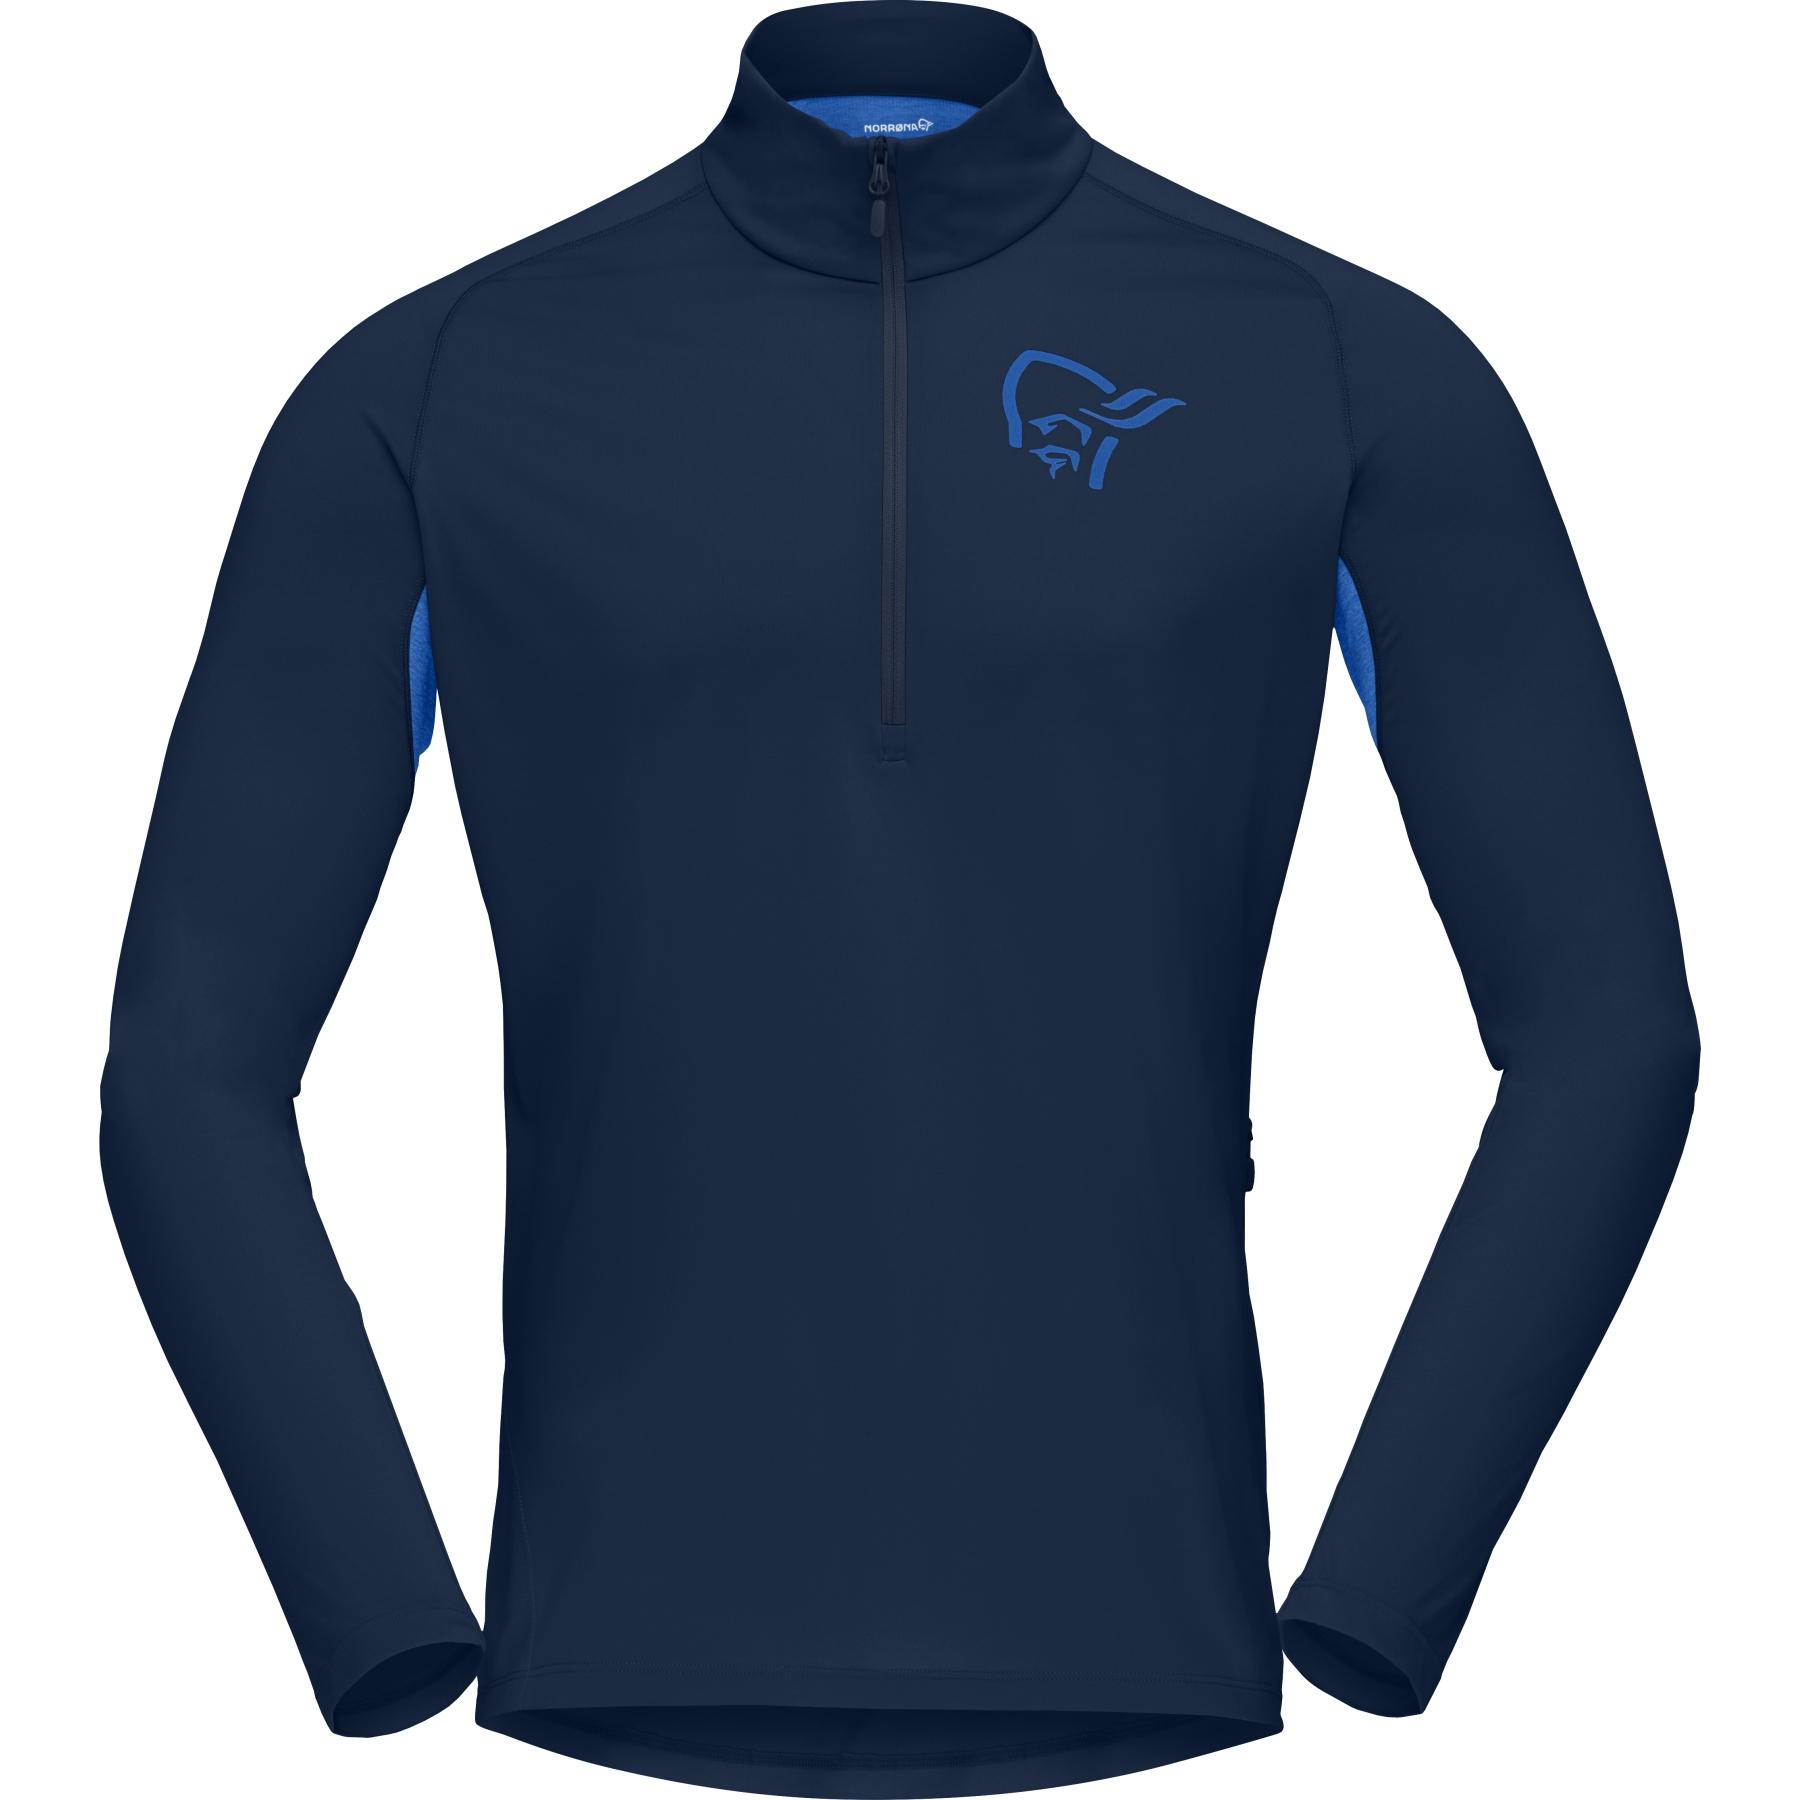 Norrona fjora equaliser Zip Top Camiseta manga larga para hombres - Indigo Night/Olympian Blue